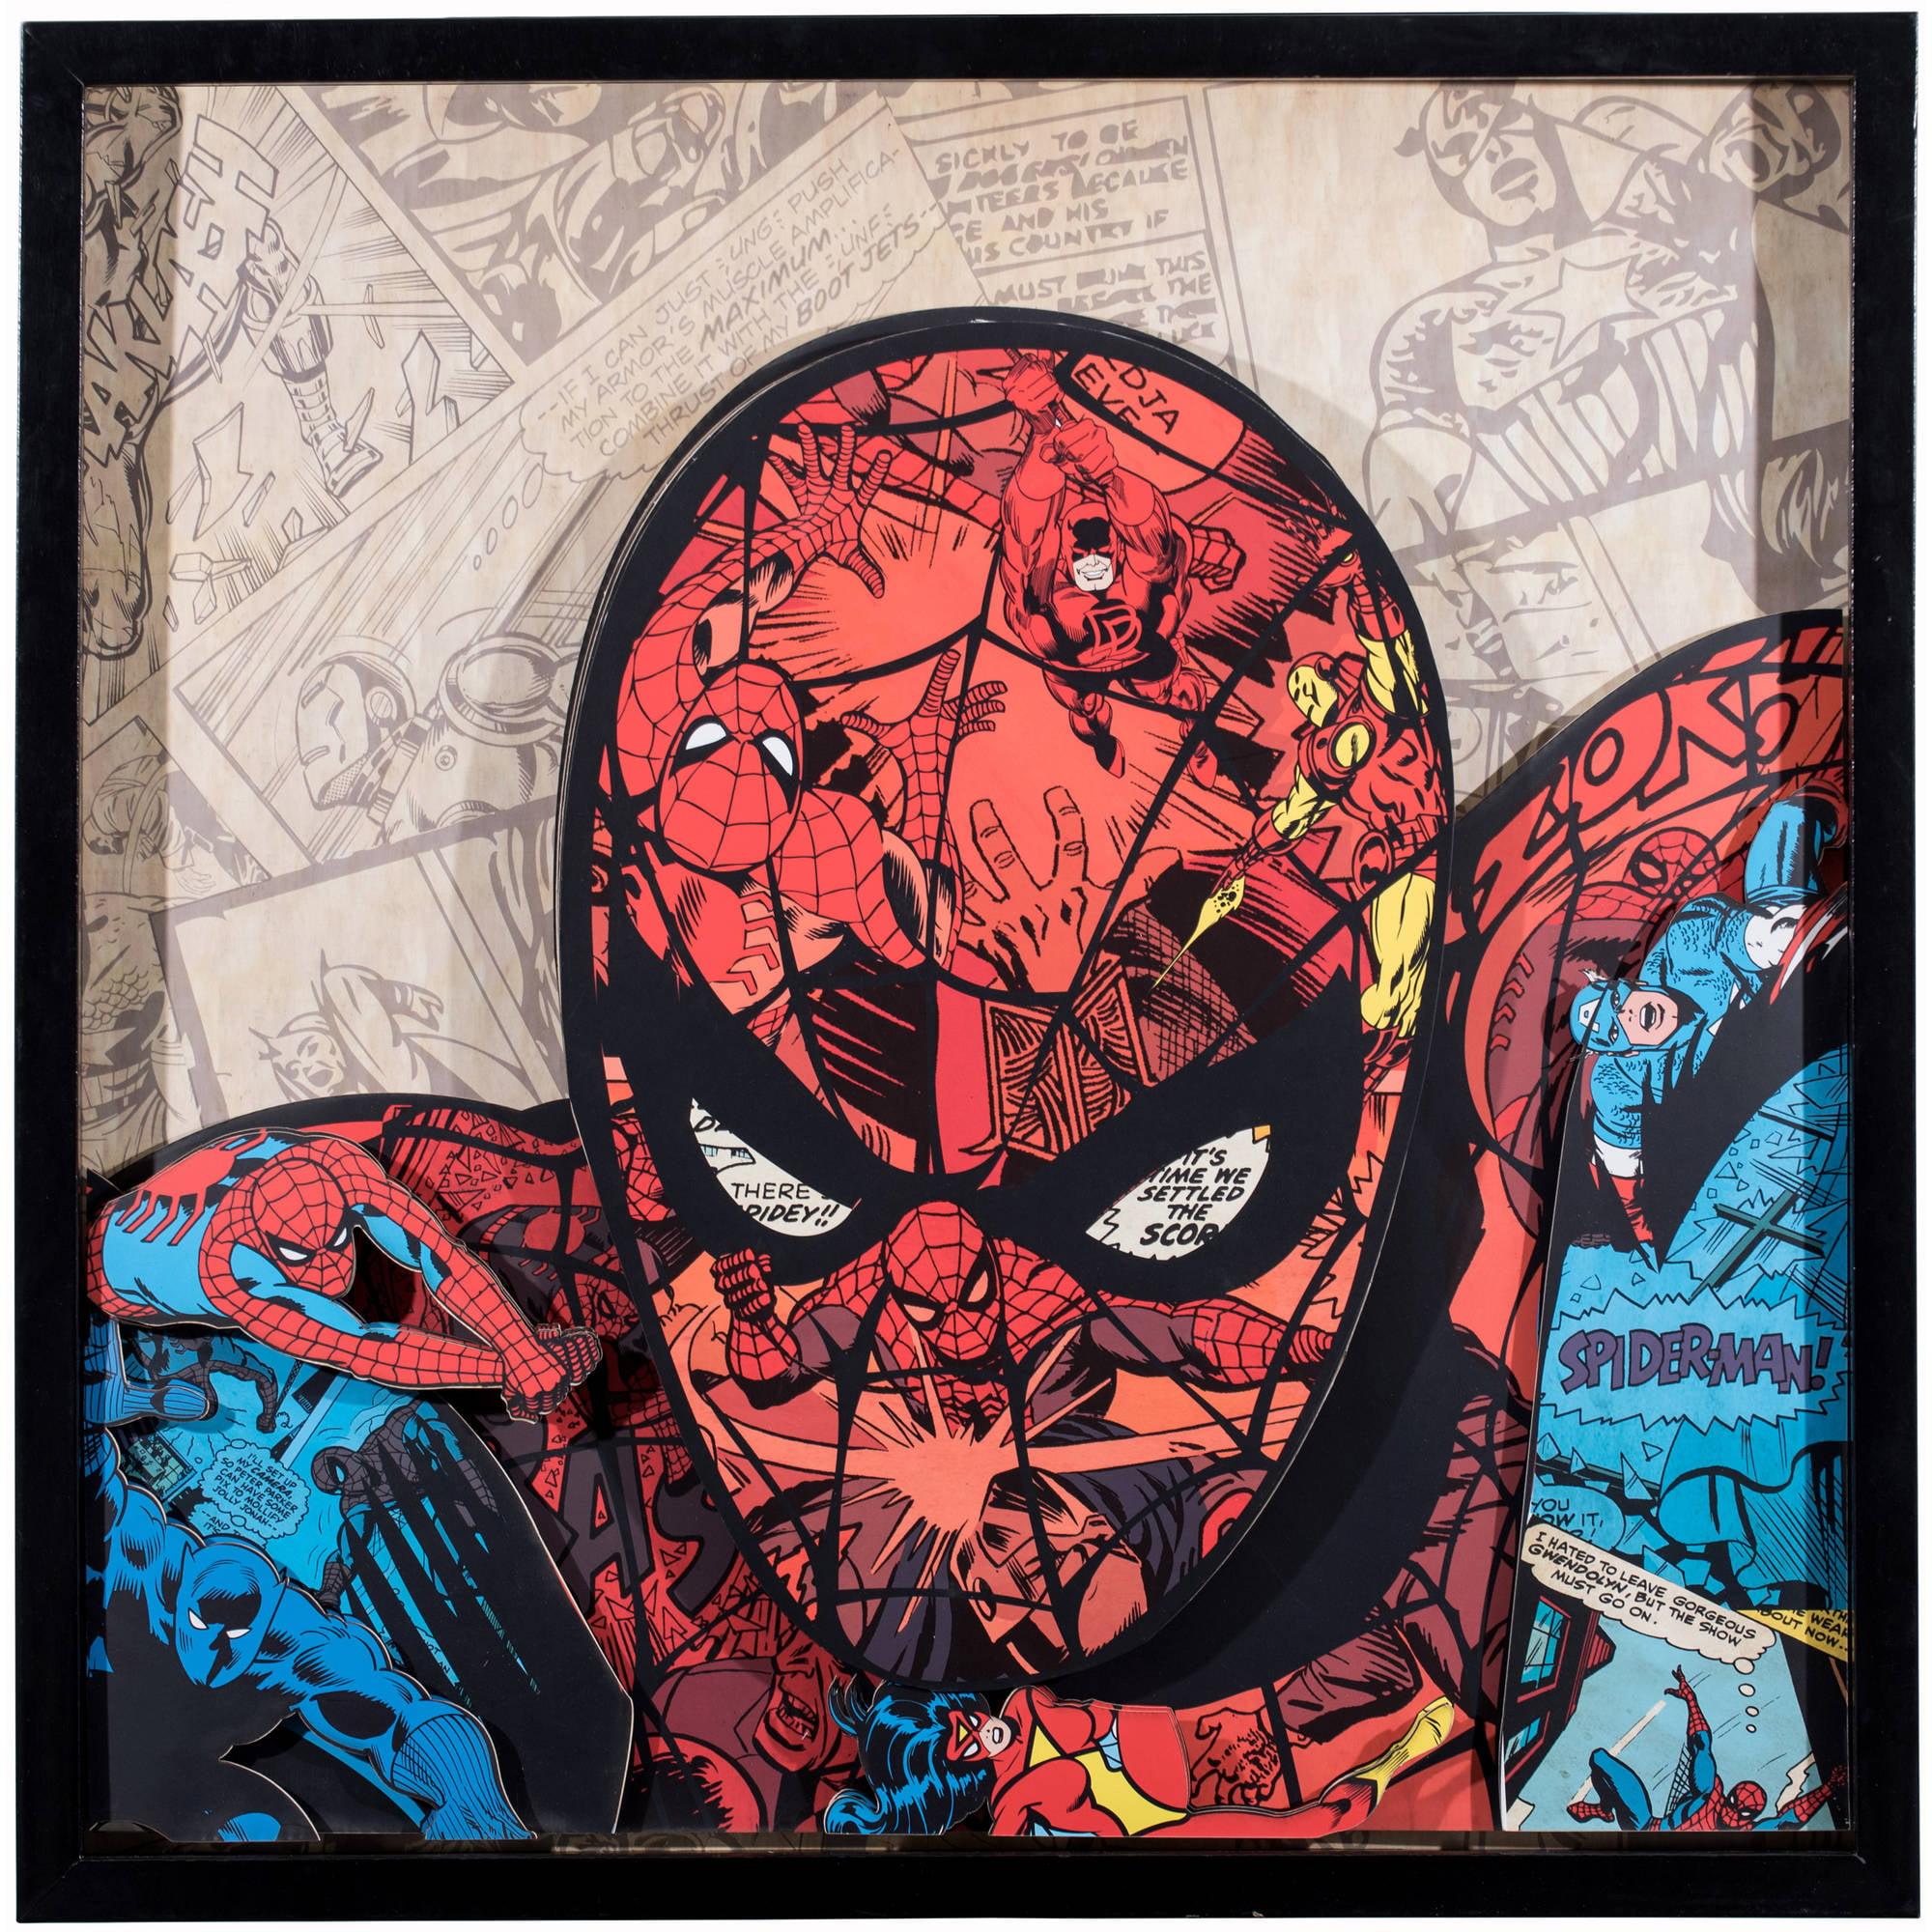 Marvel Comics Spider-Man Handmade Collage in Shadowbox Frame Wall Art